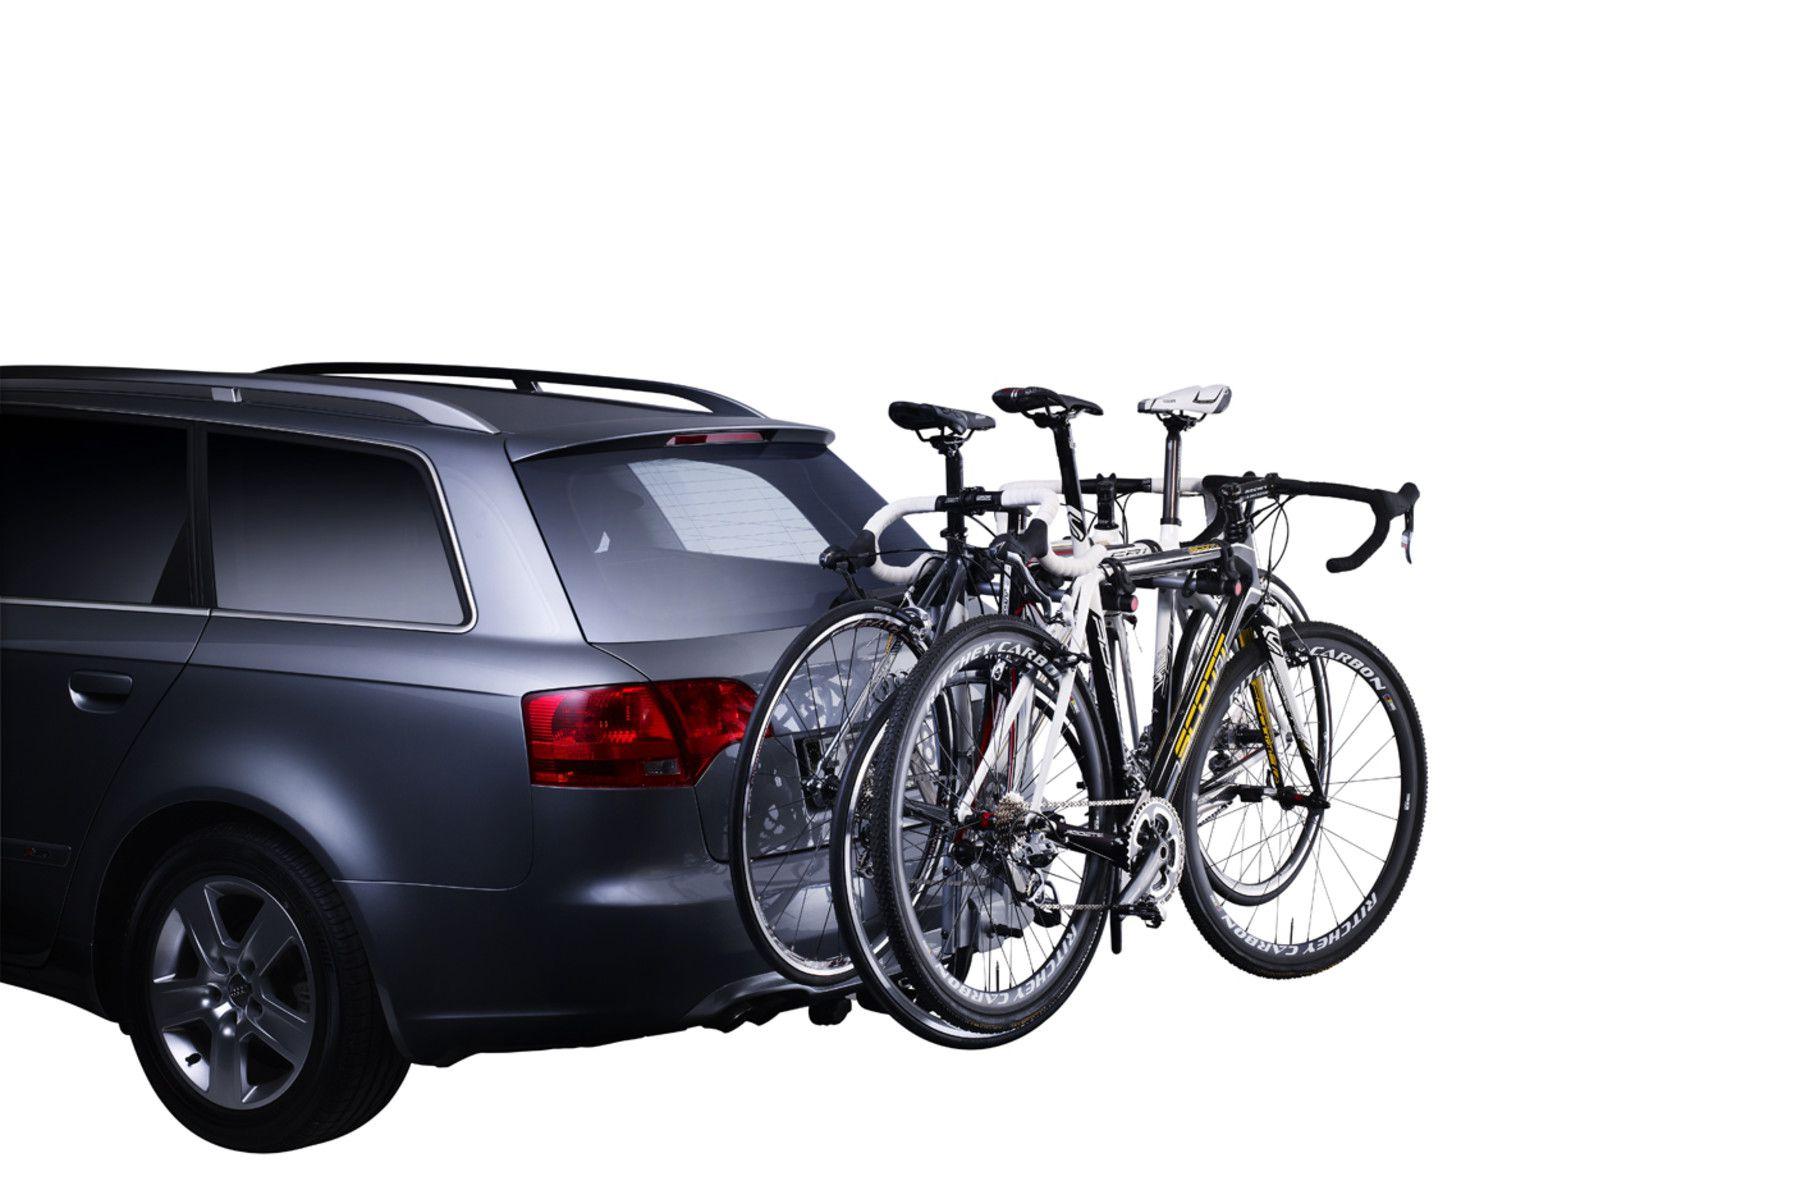 Suporte de Engate para Bicicleta Thule HangOn 3 Bicicletas